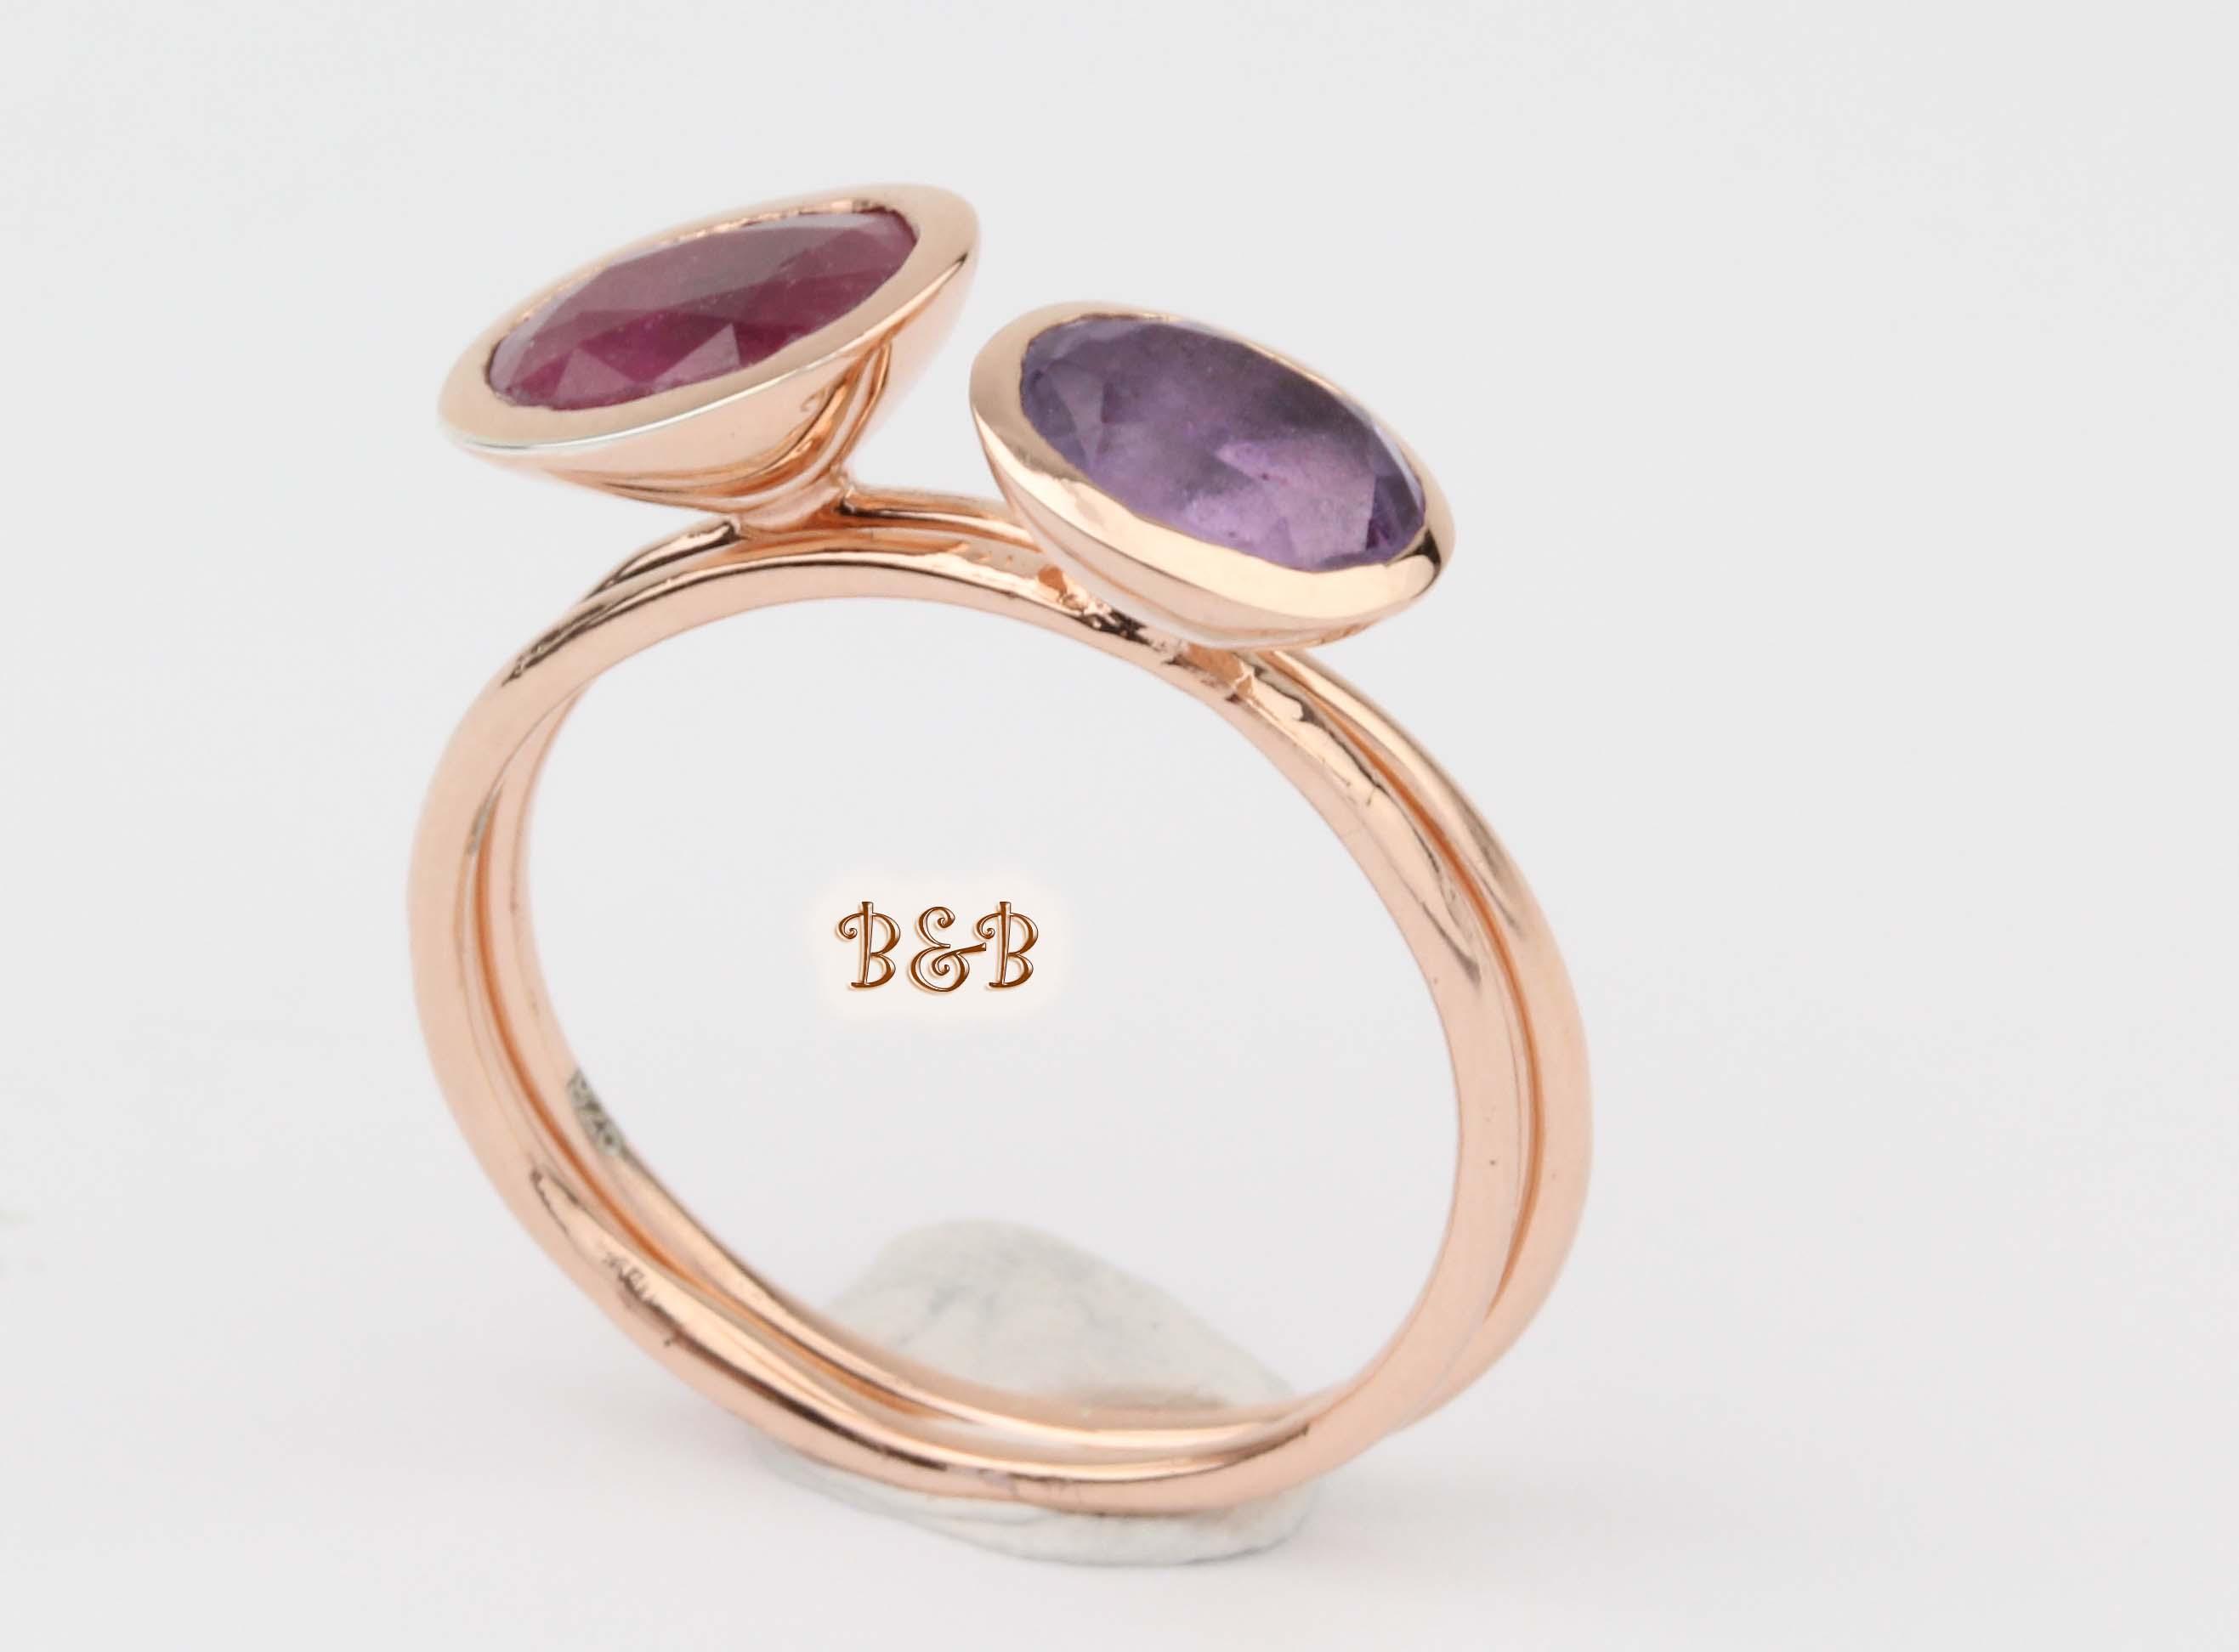 Silver ring_B&B_1863